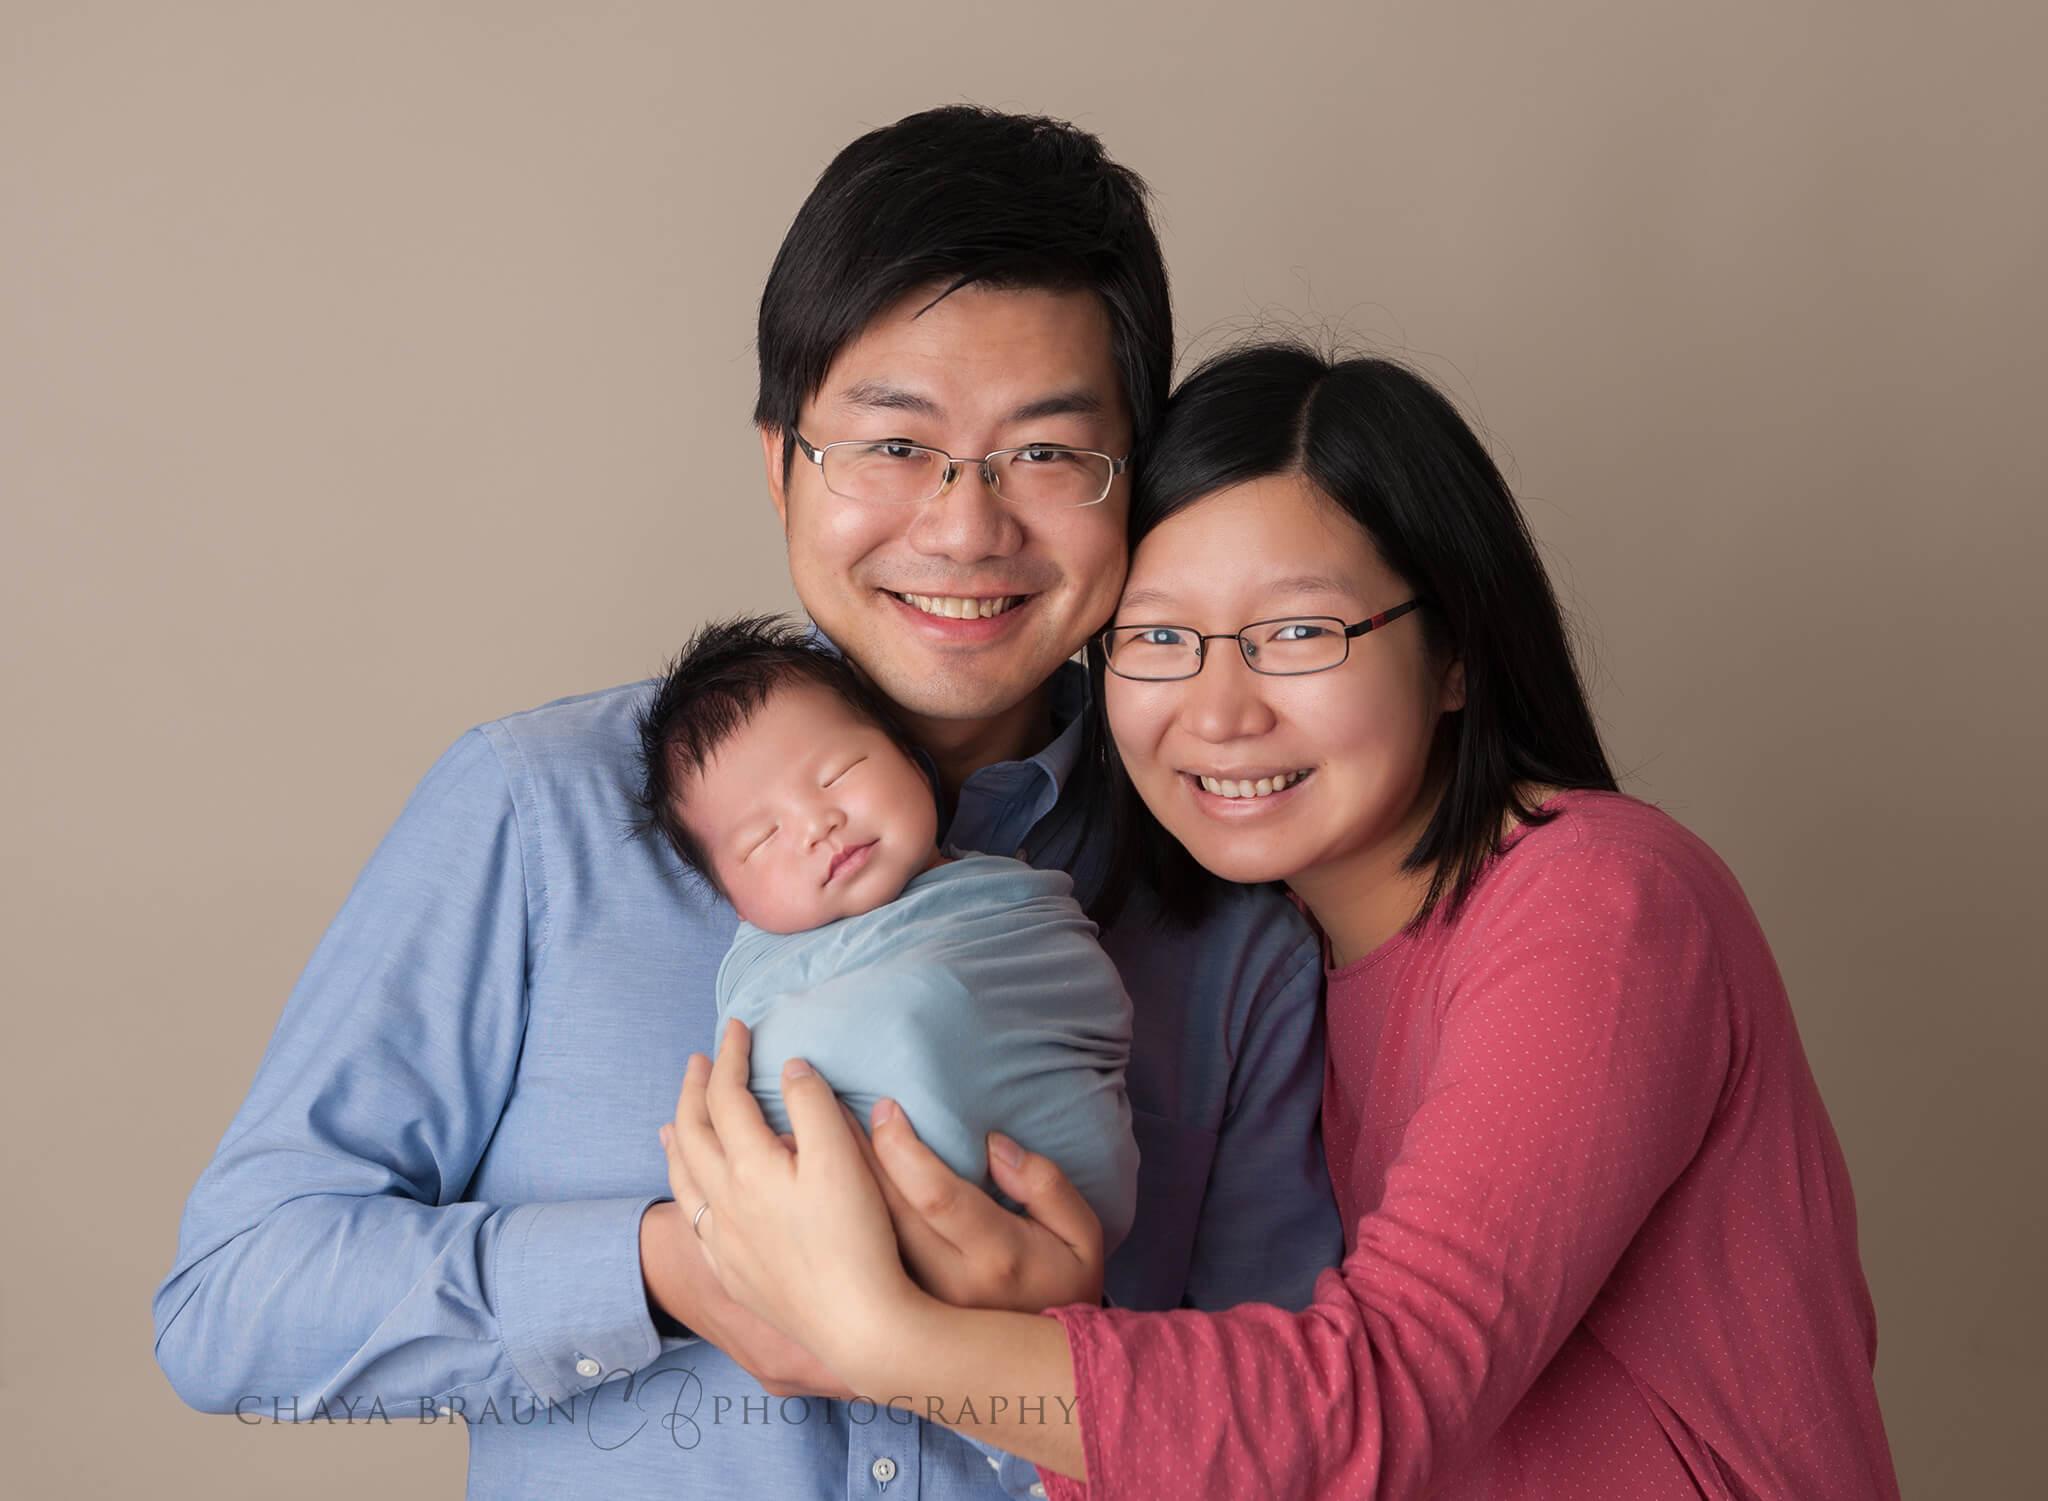 newborn baby and parents photo